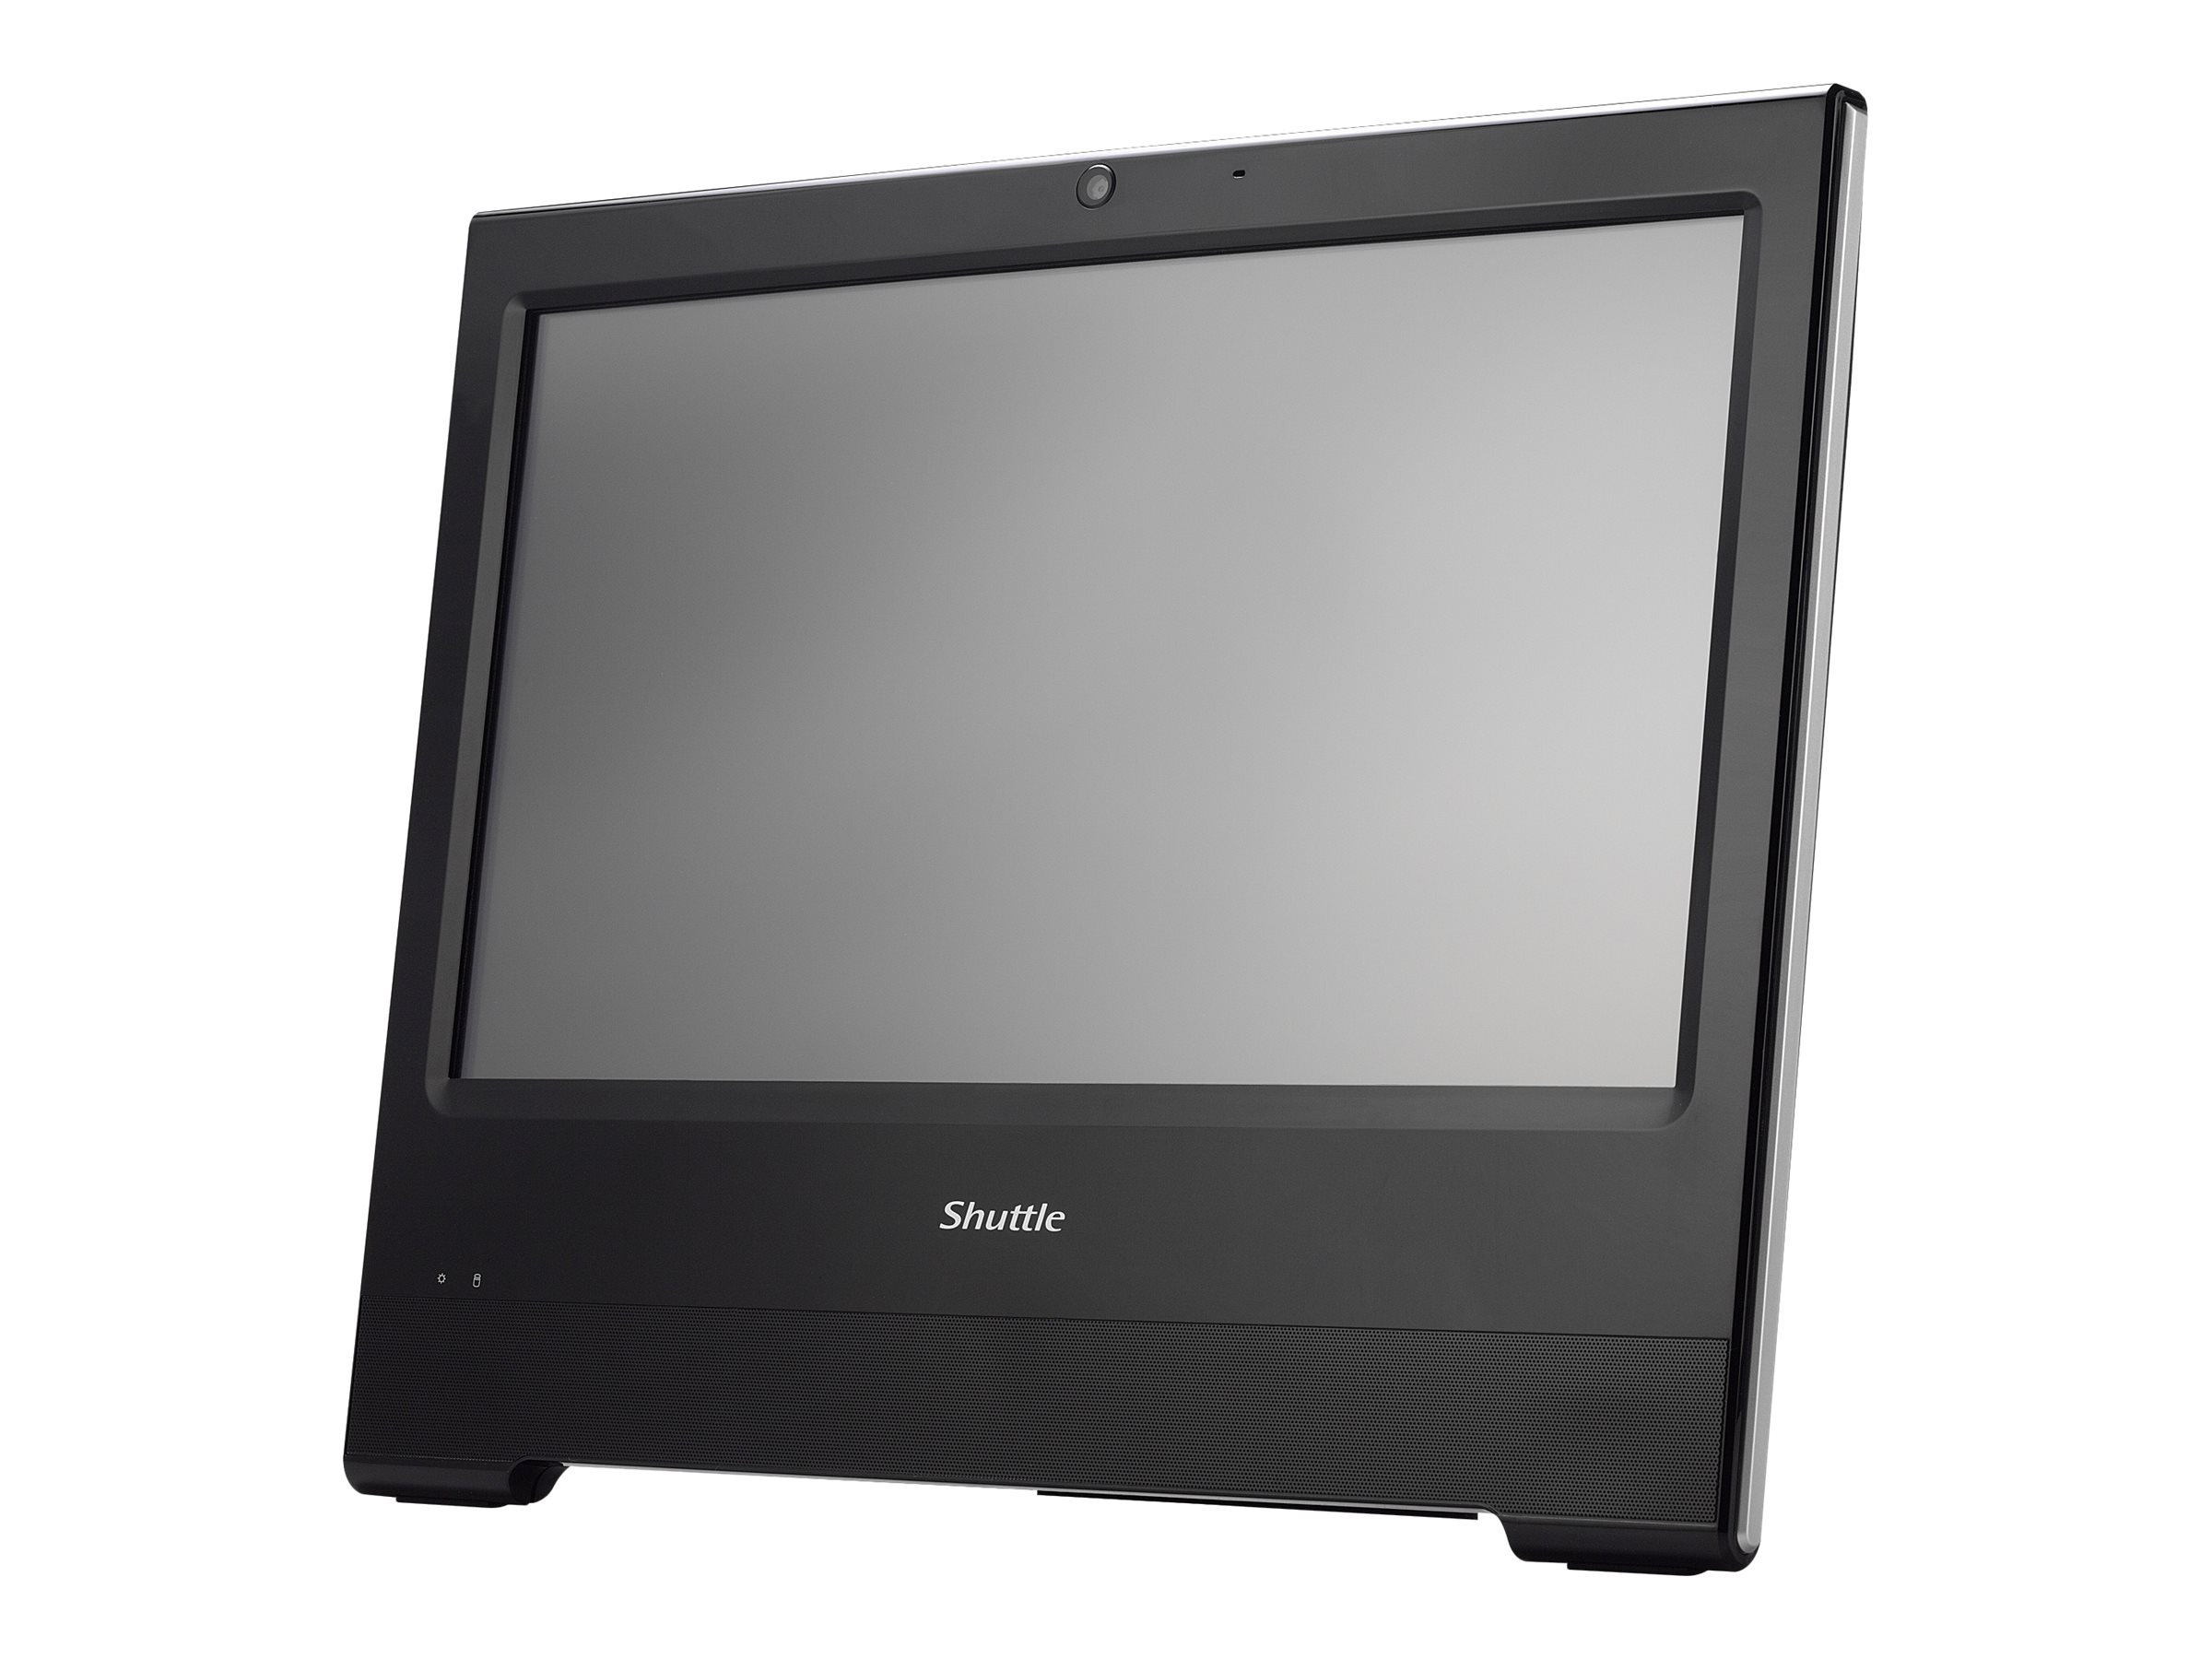 Shuttle POS X506 - All-in-One (Komplettlösung) - 1 x Celeron 3865U / 1.8 GHz ULV - RAM 4 GB - SSD 60 GB - HD Graphics 610